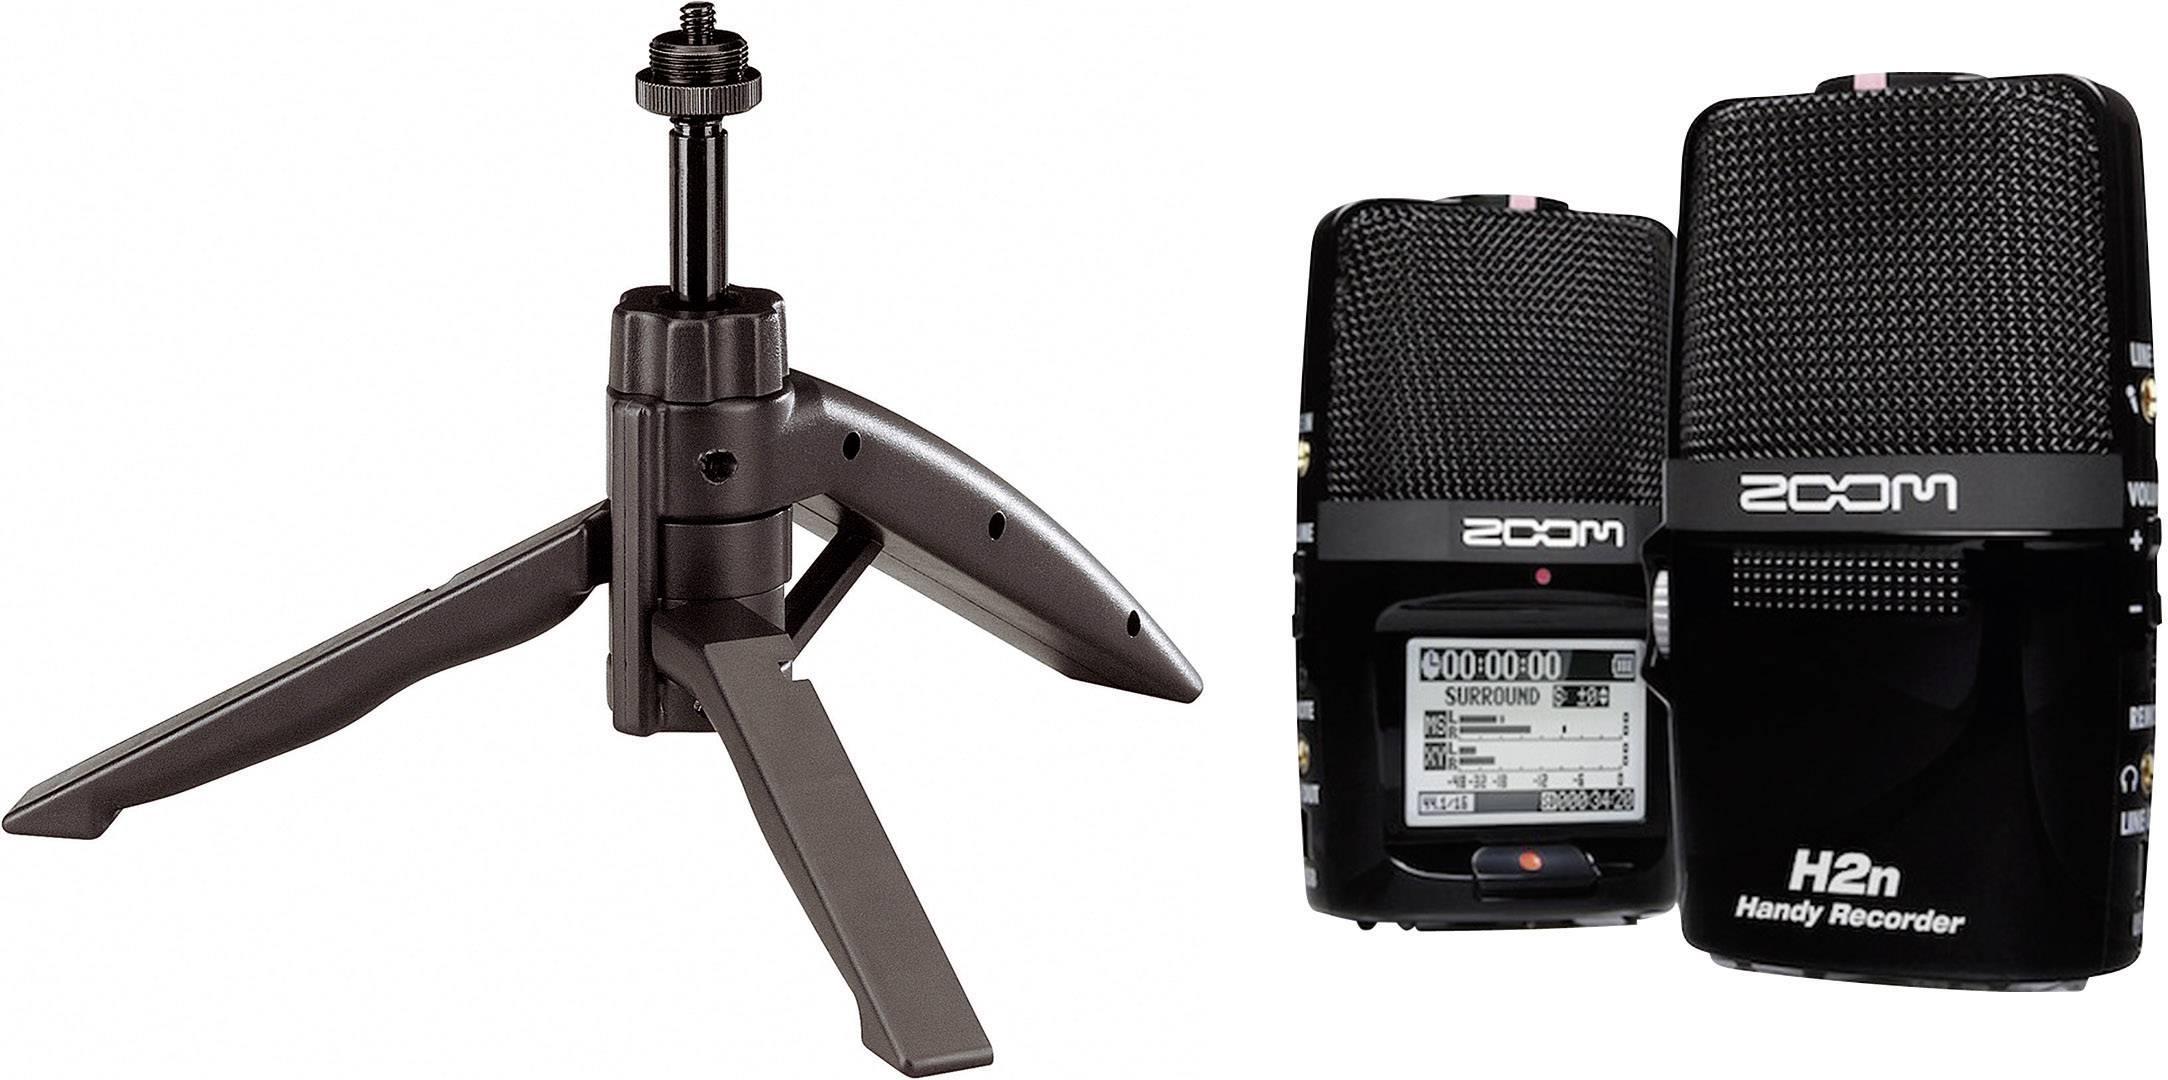 Mobilný audio rekordér Zoom H2n Bundle, čierna